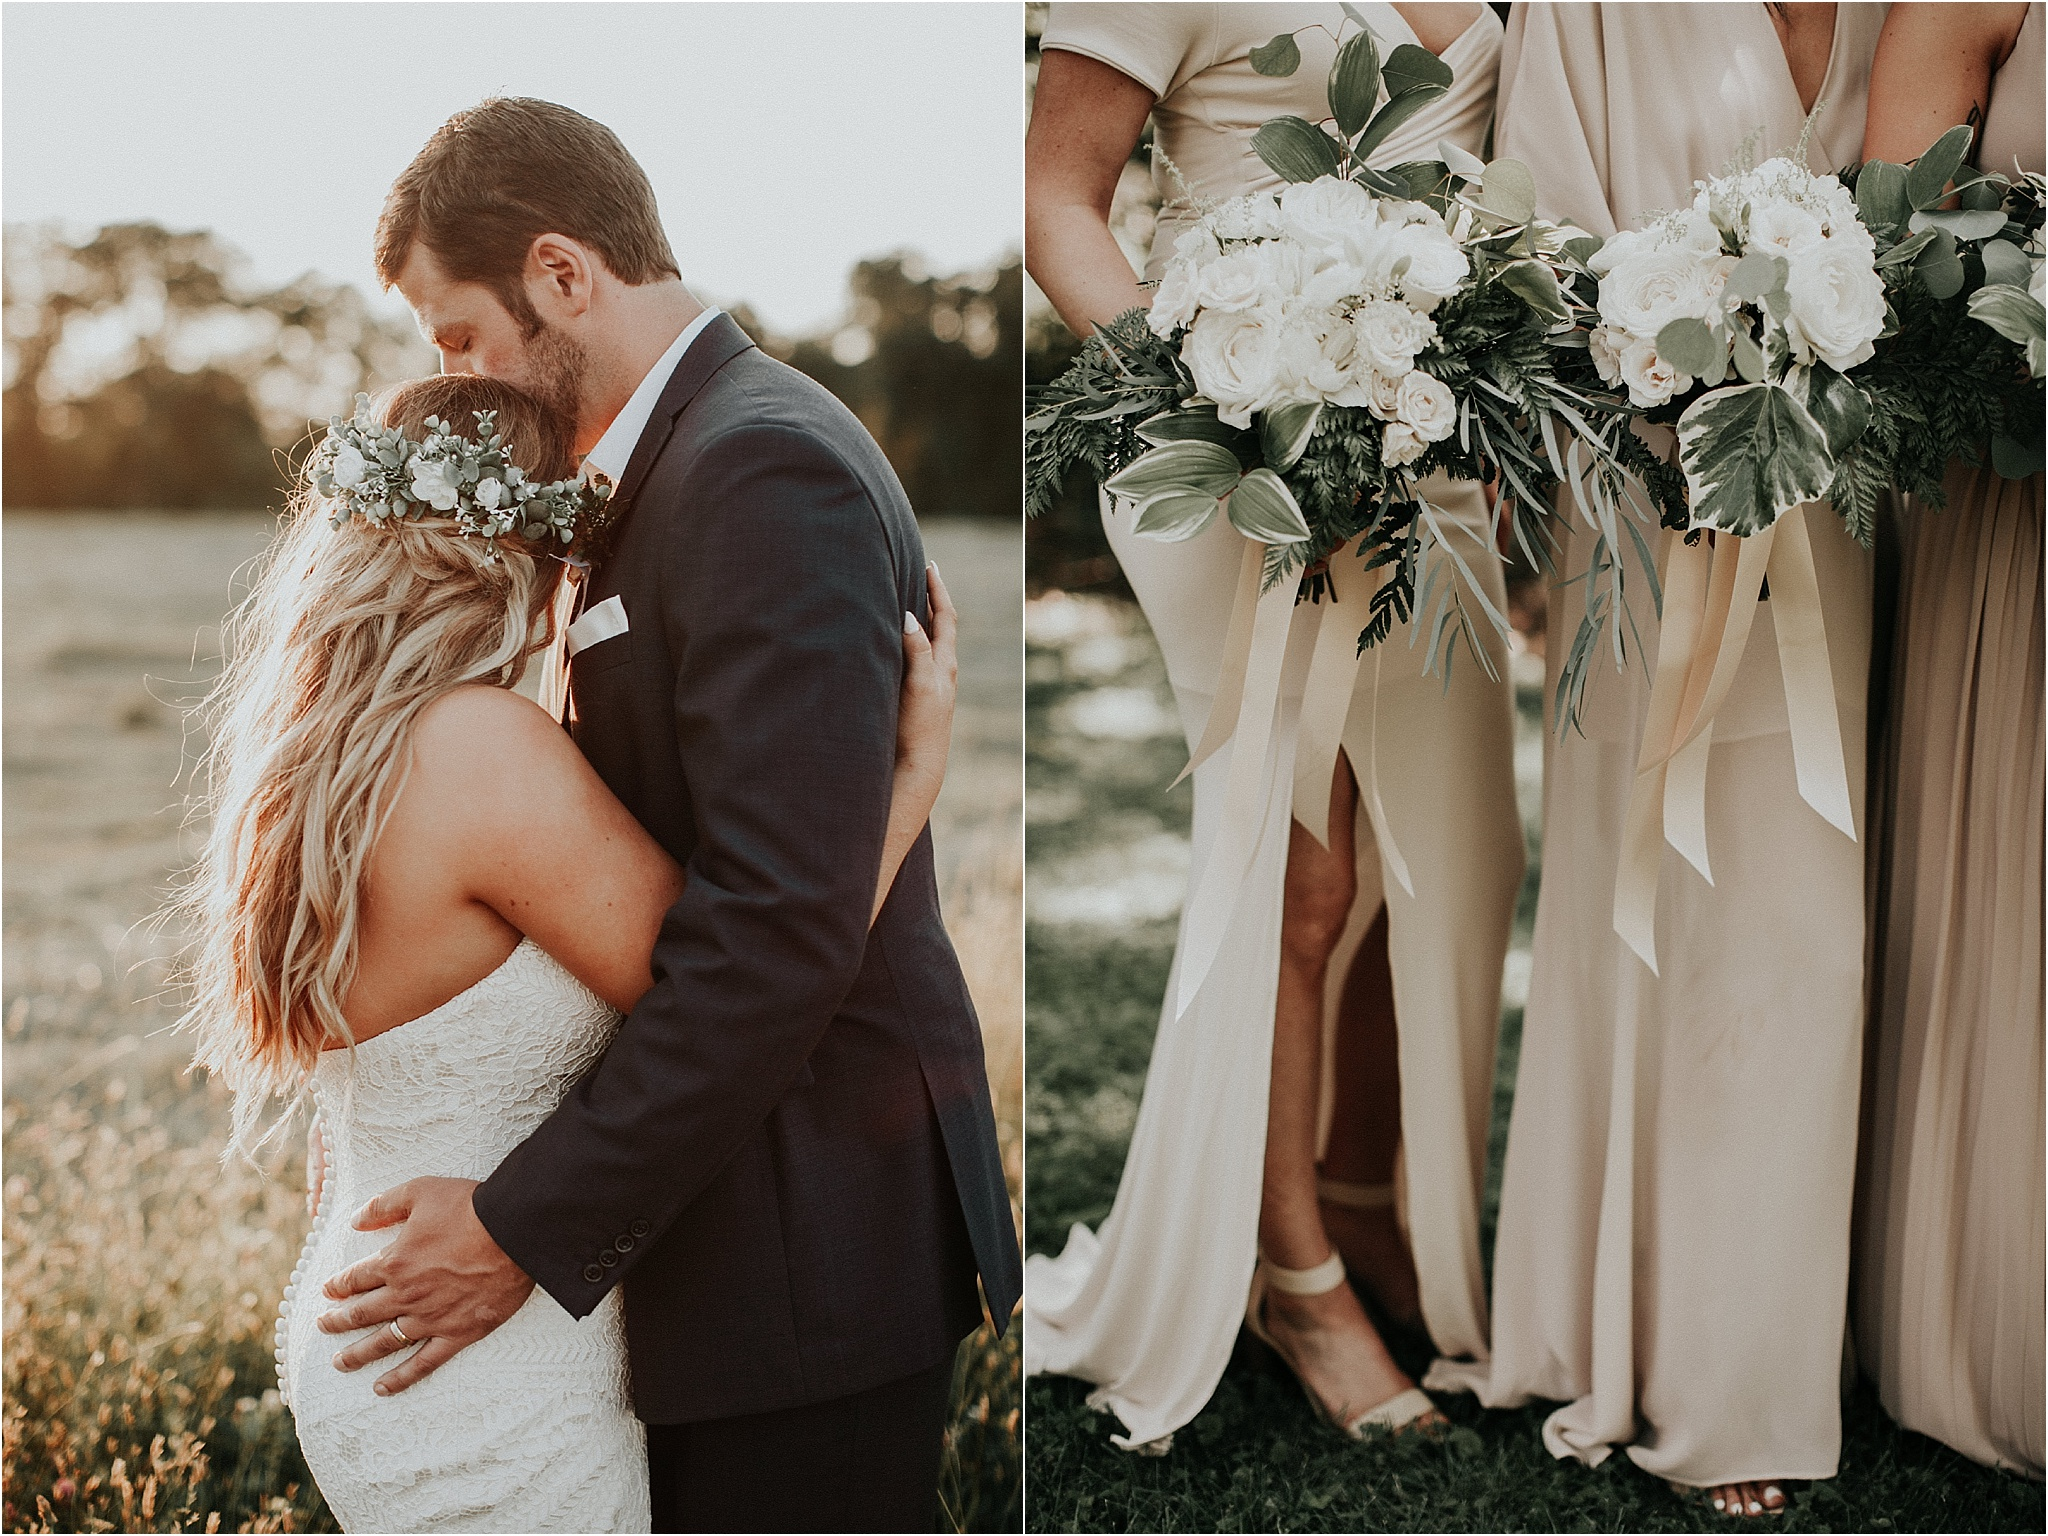 Sarah_Brookhart_Baltimore_Philly_Wedding_Photographer_0040.jpg